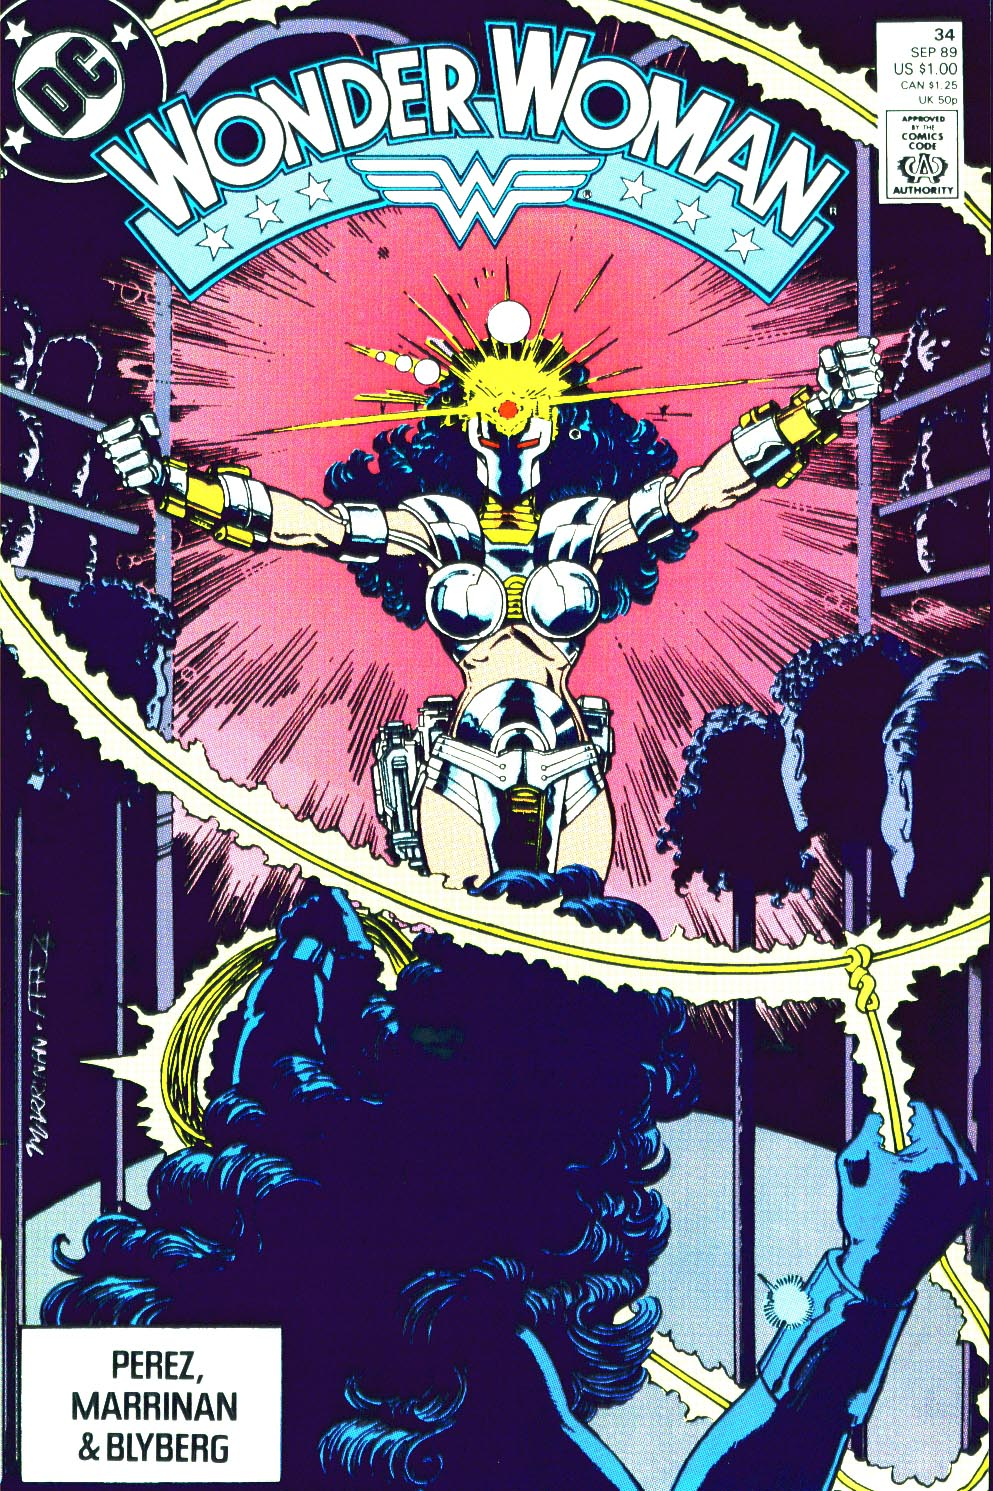 Read online Wonder Woman (1987) comic -  Issue #34 - 1